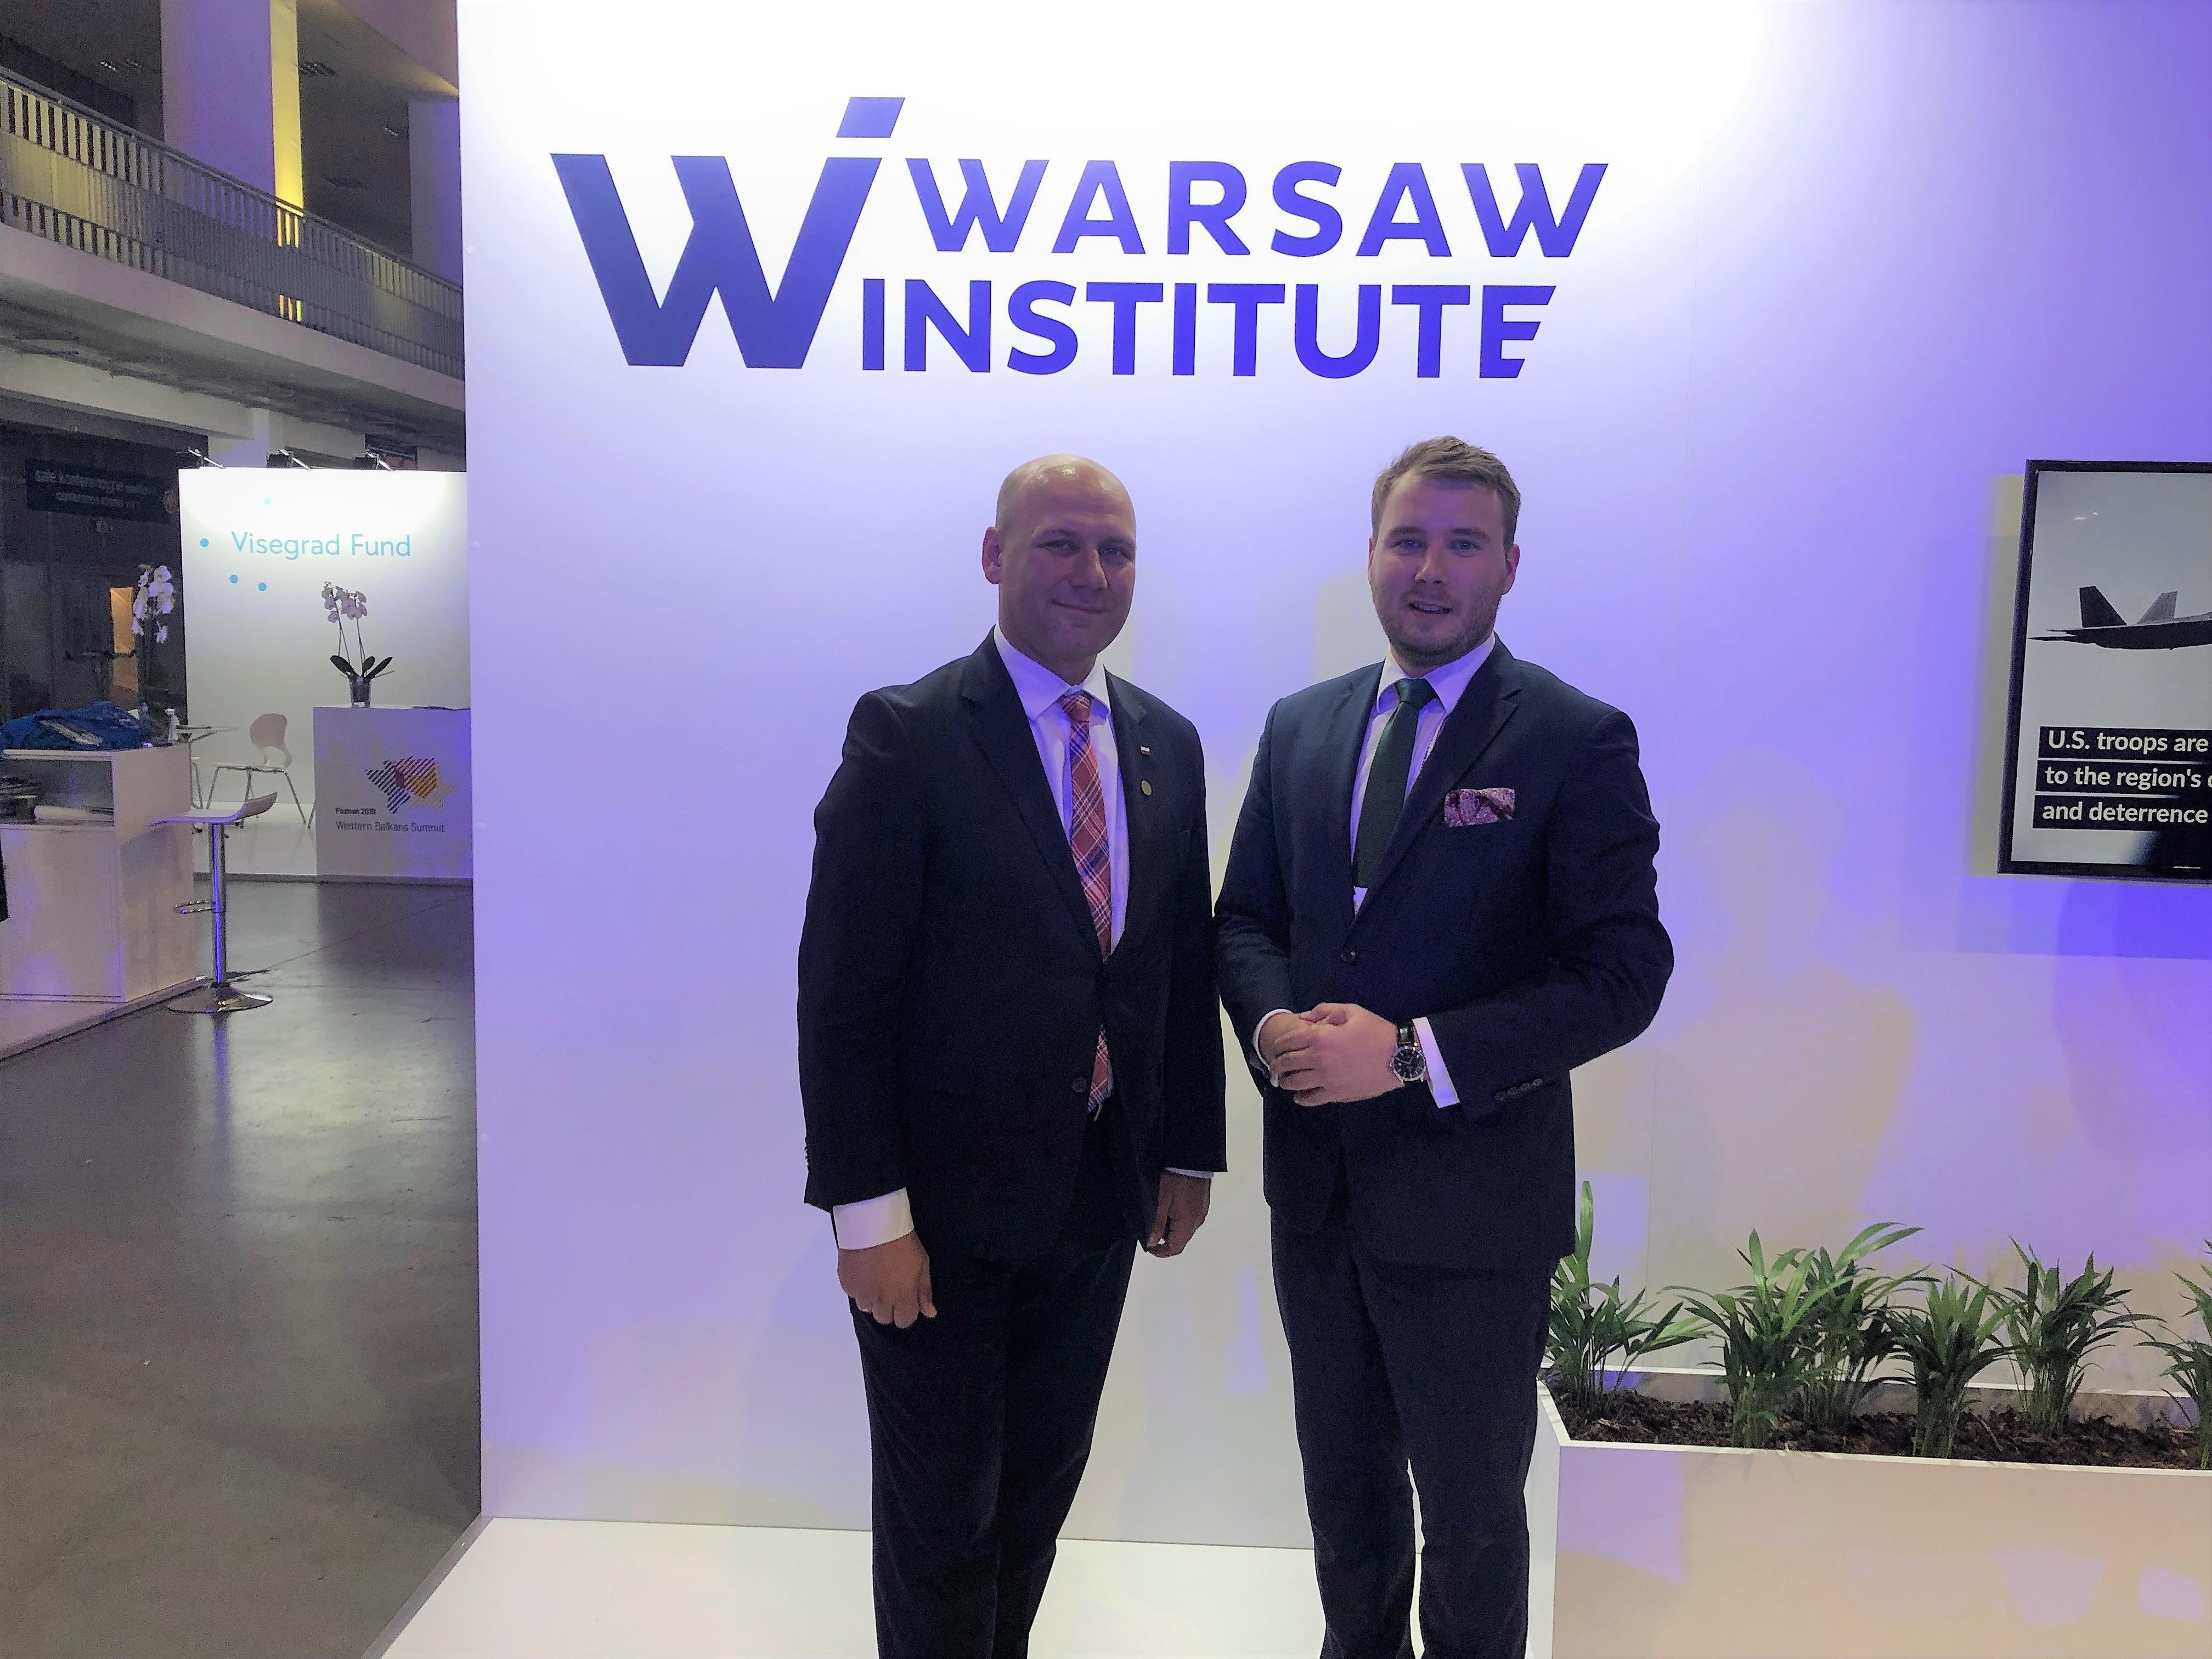 western balkans summit 2019 in Poznan warsaw institute szynkowski vel sek kaminski